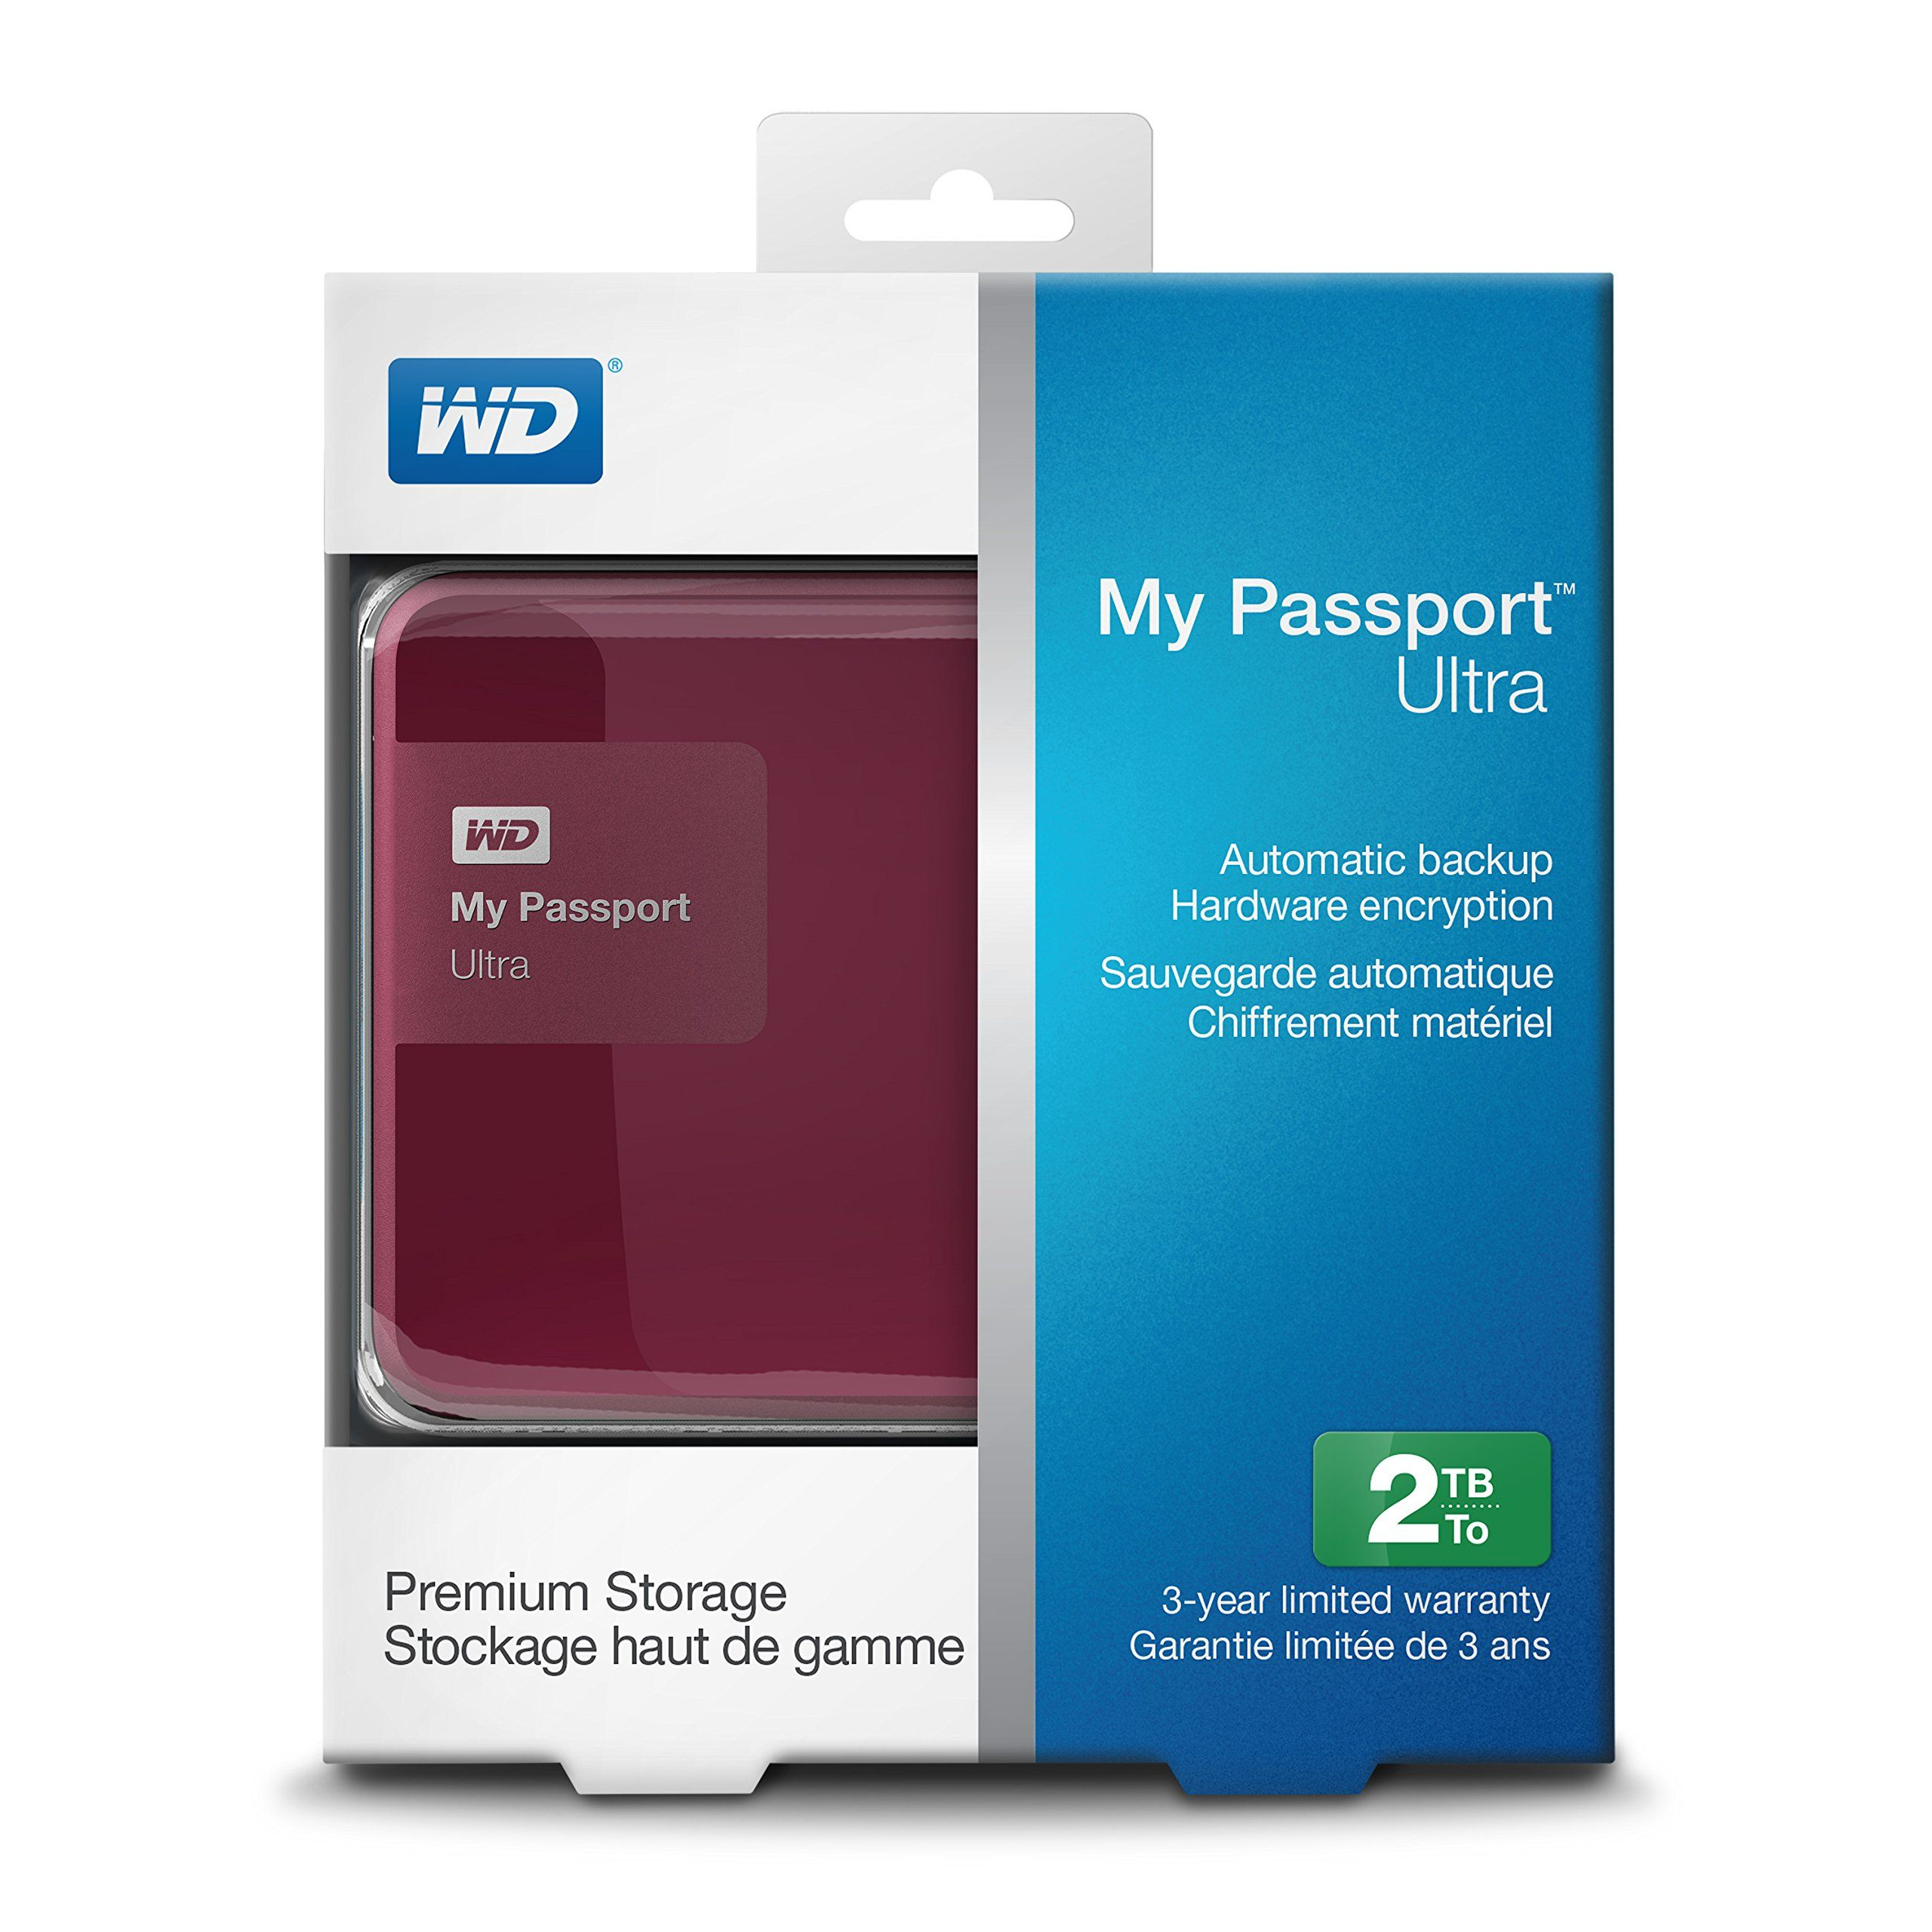 94 Amazon Com Wd My Passport Ultra 2 Tb Portable External Hard Drive Berry Wdbbkd0020bby Nesn Electronics Portable Hard Drives